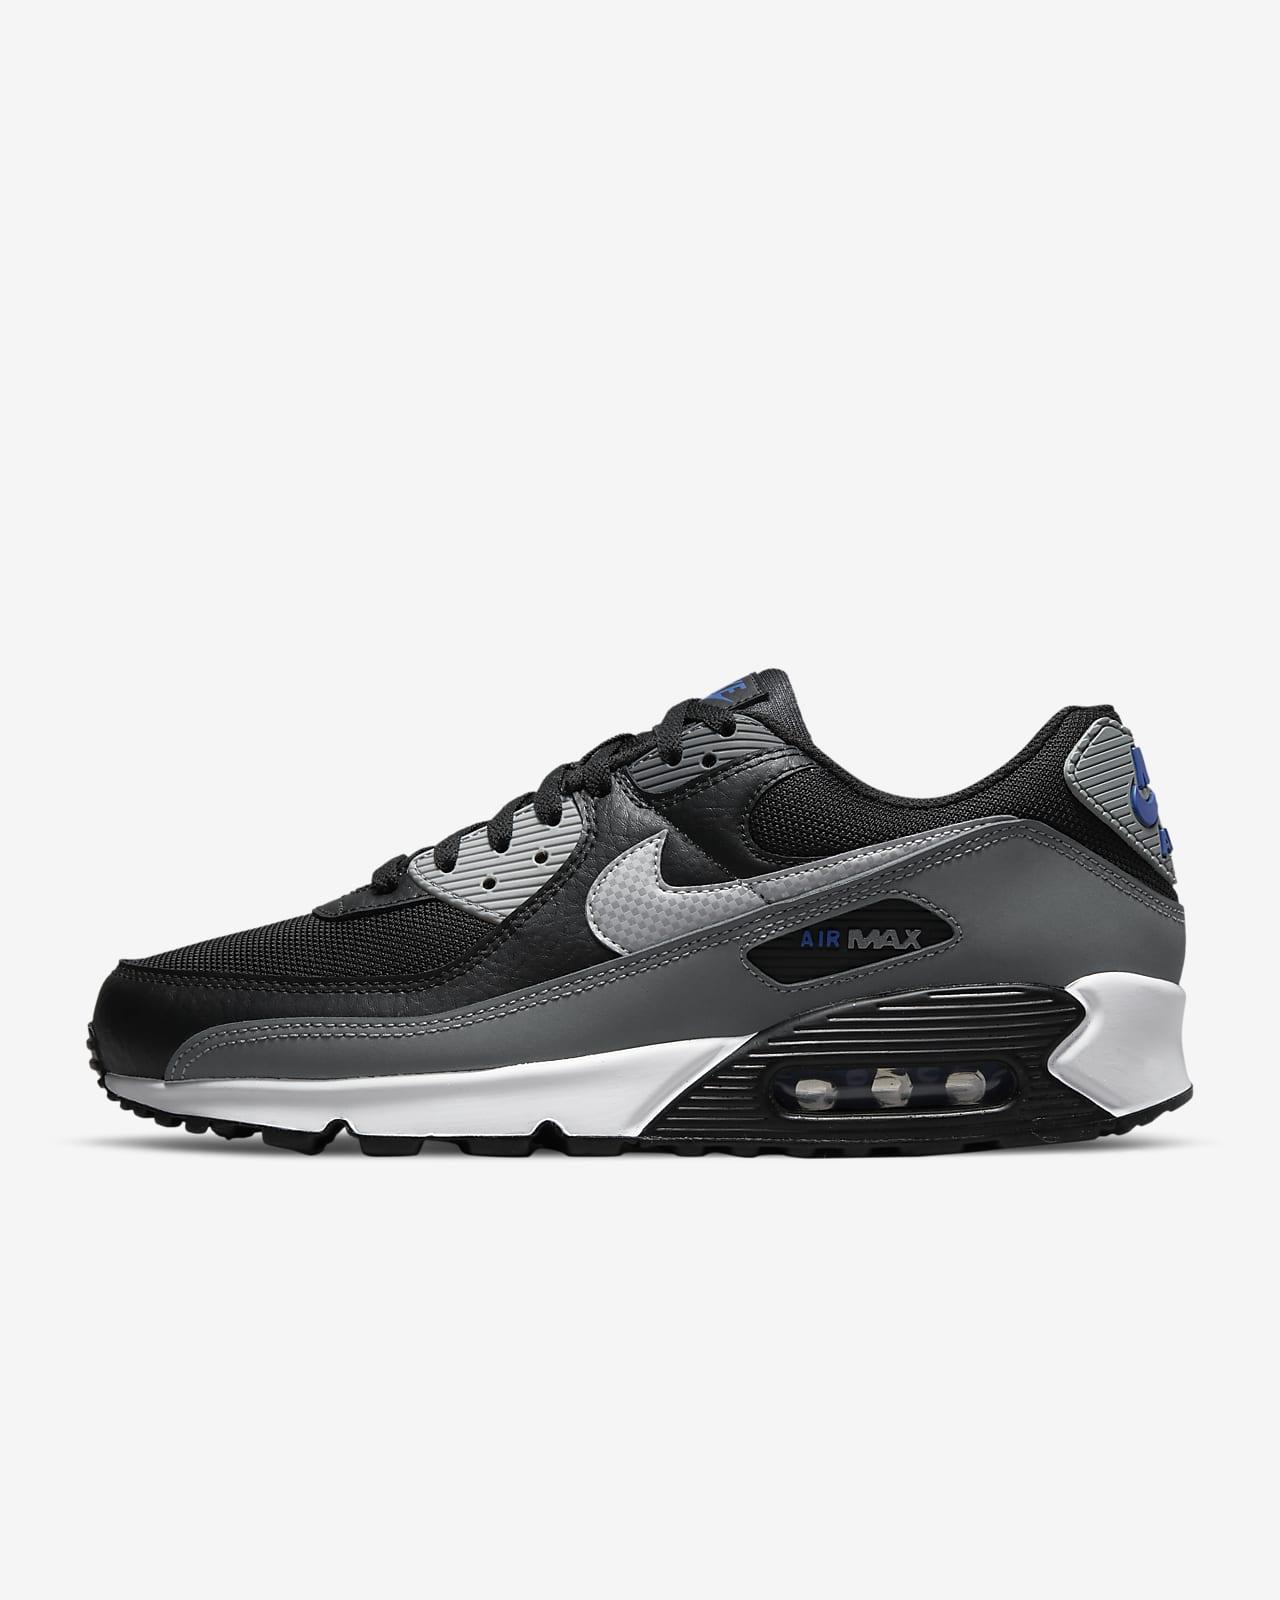 Chaussures Nike Air Max 90 pour Homme. Nike LU